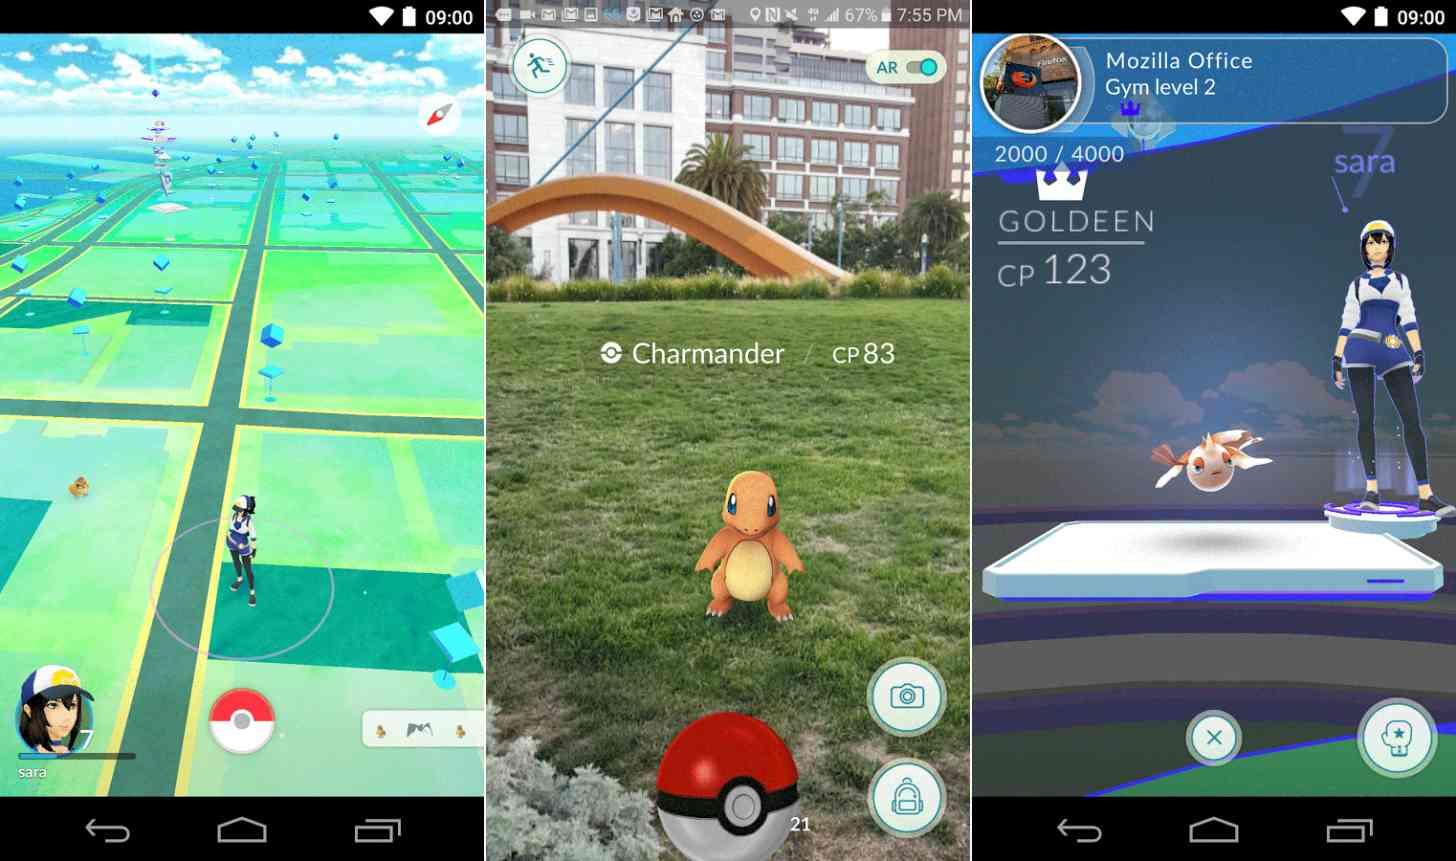 Pokémon Go Android app screenshots